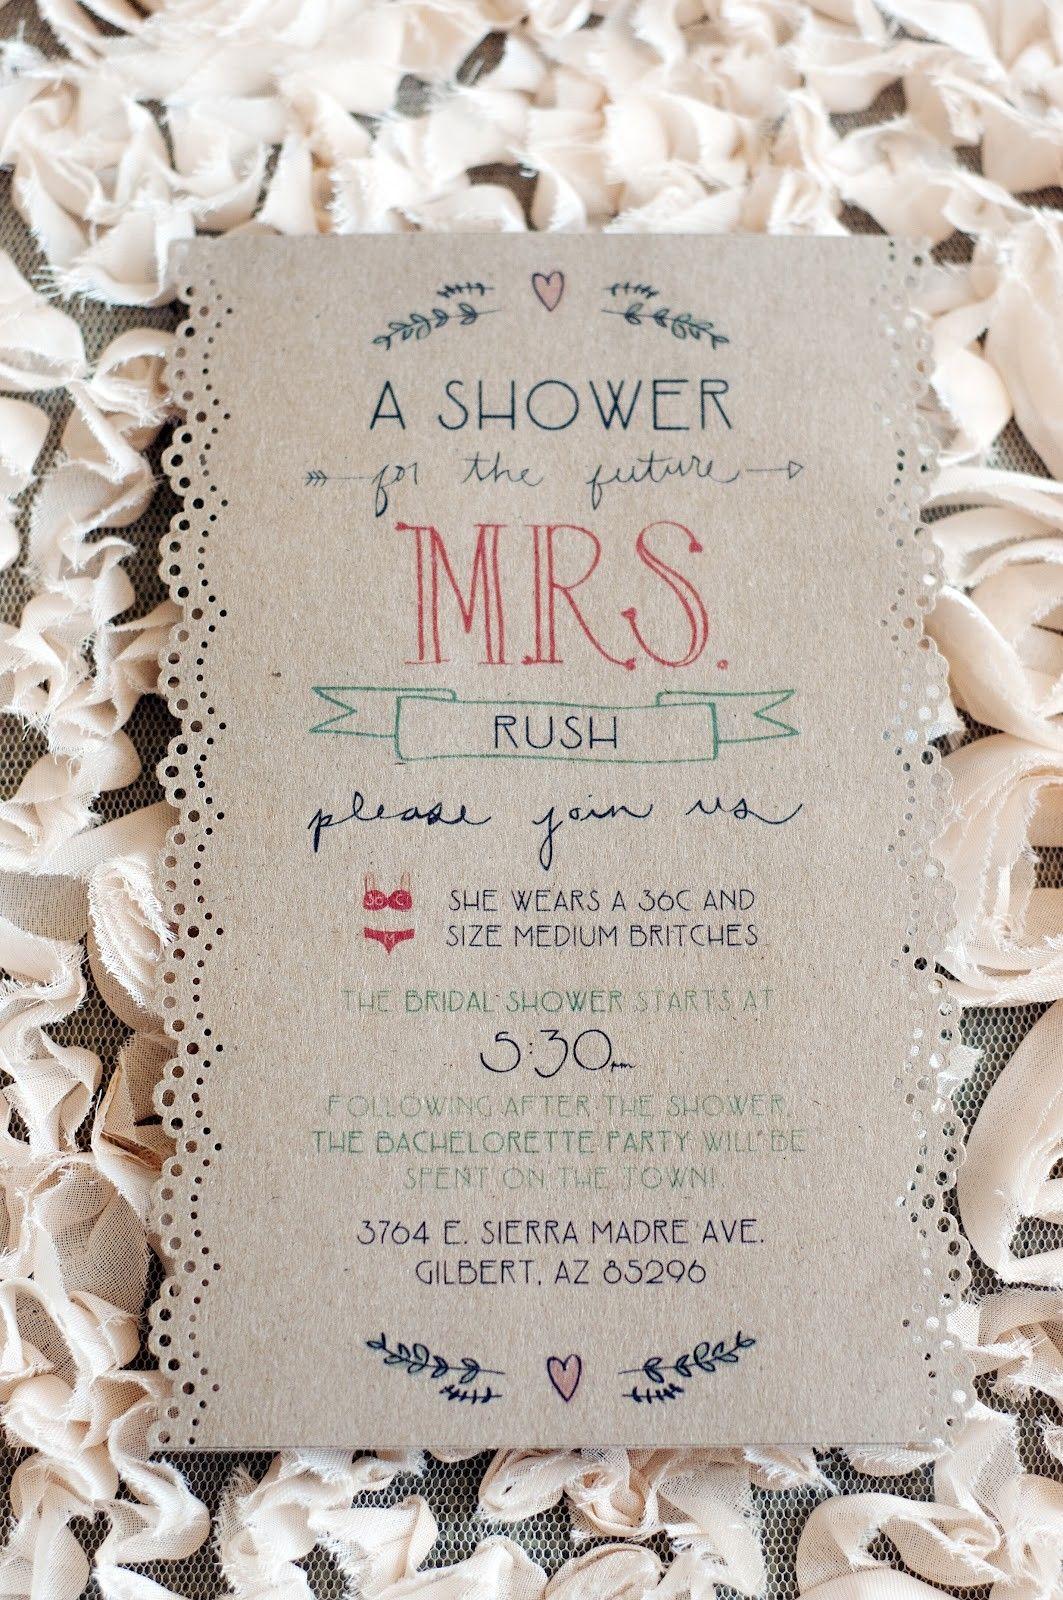 Handmade bridal shower invitations pinterest httphandcraftedwin handmade bridal shower invitations pinterest httphandcraftedwin handmade thanksgiving pinterest shower invitations bridal showers and bridal filmwisefo